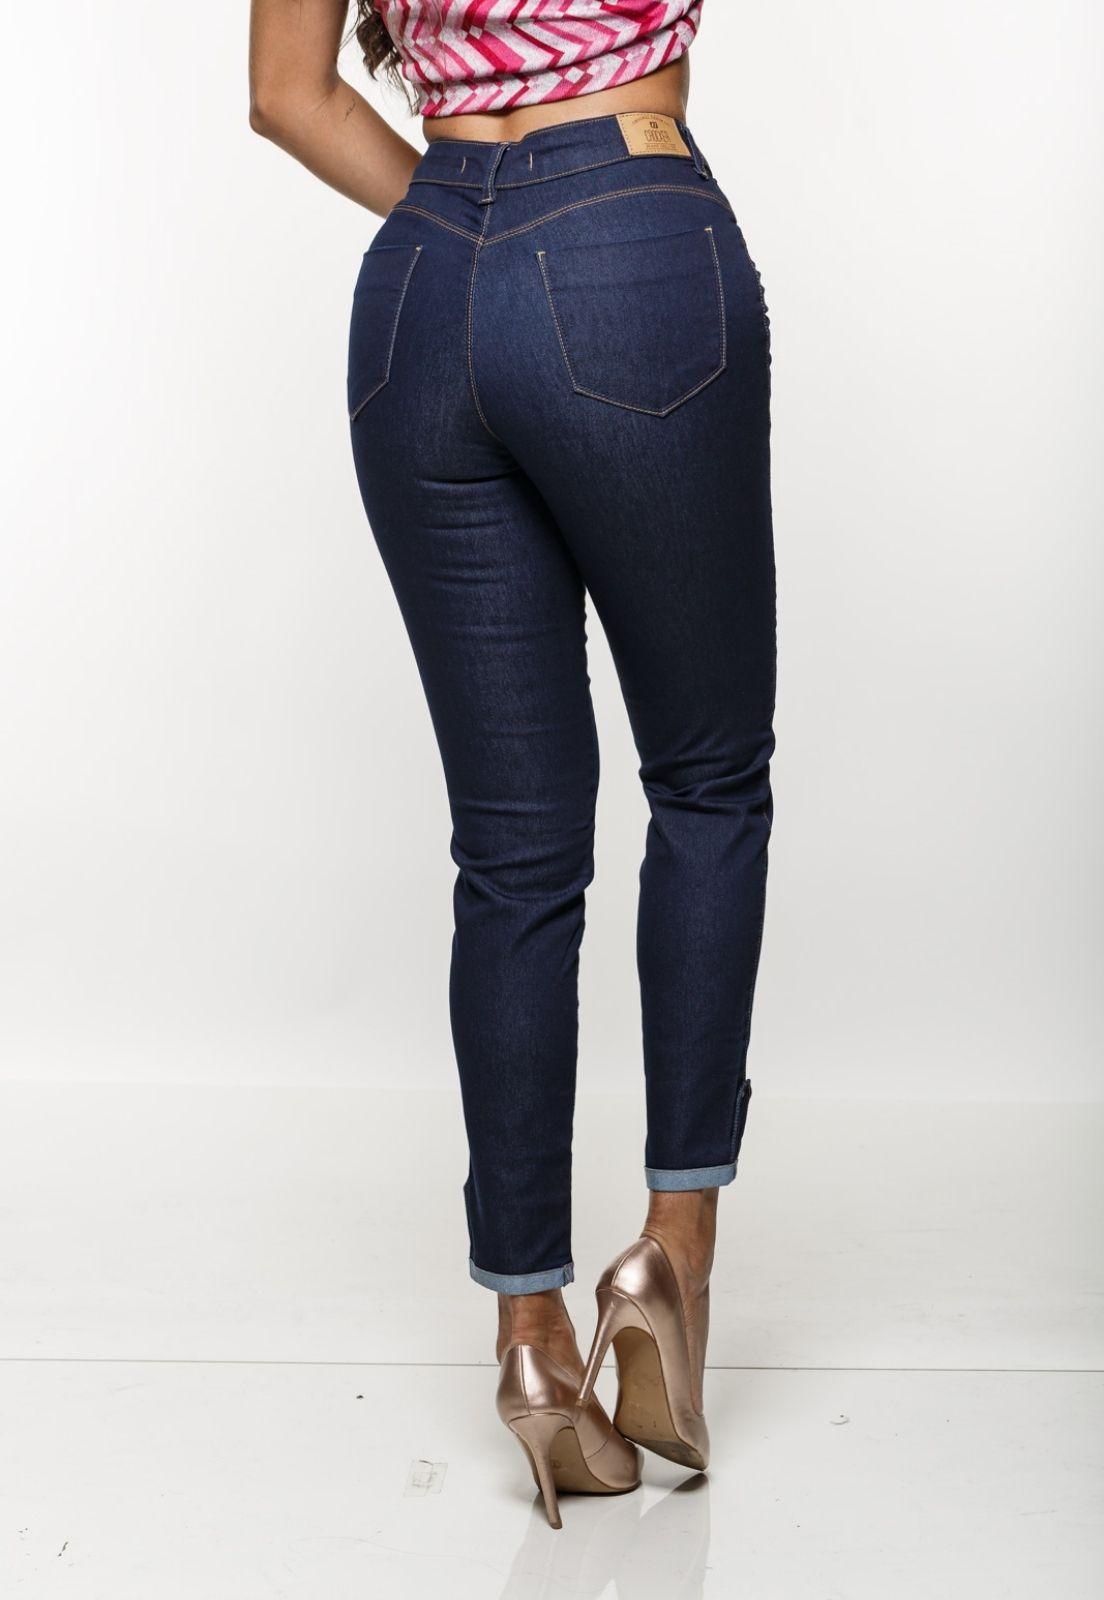 Cigarrete  Jeans Feminina Crocker - 48120  - CROCKER JEANS